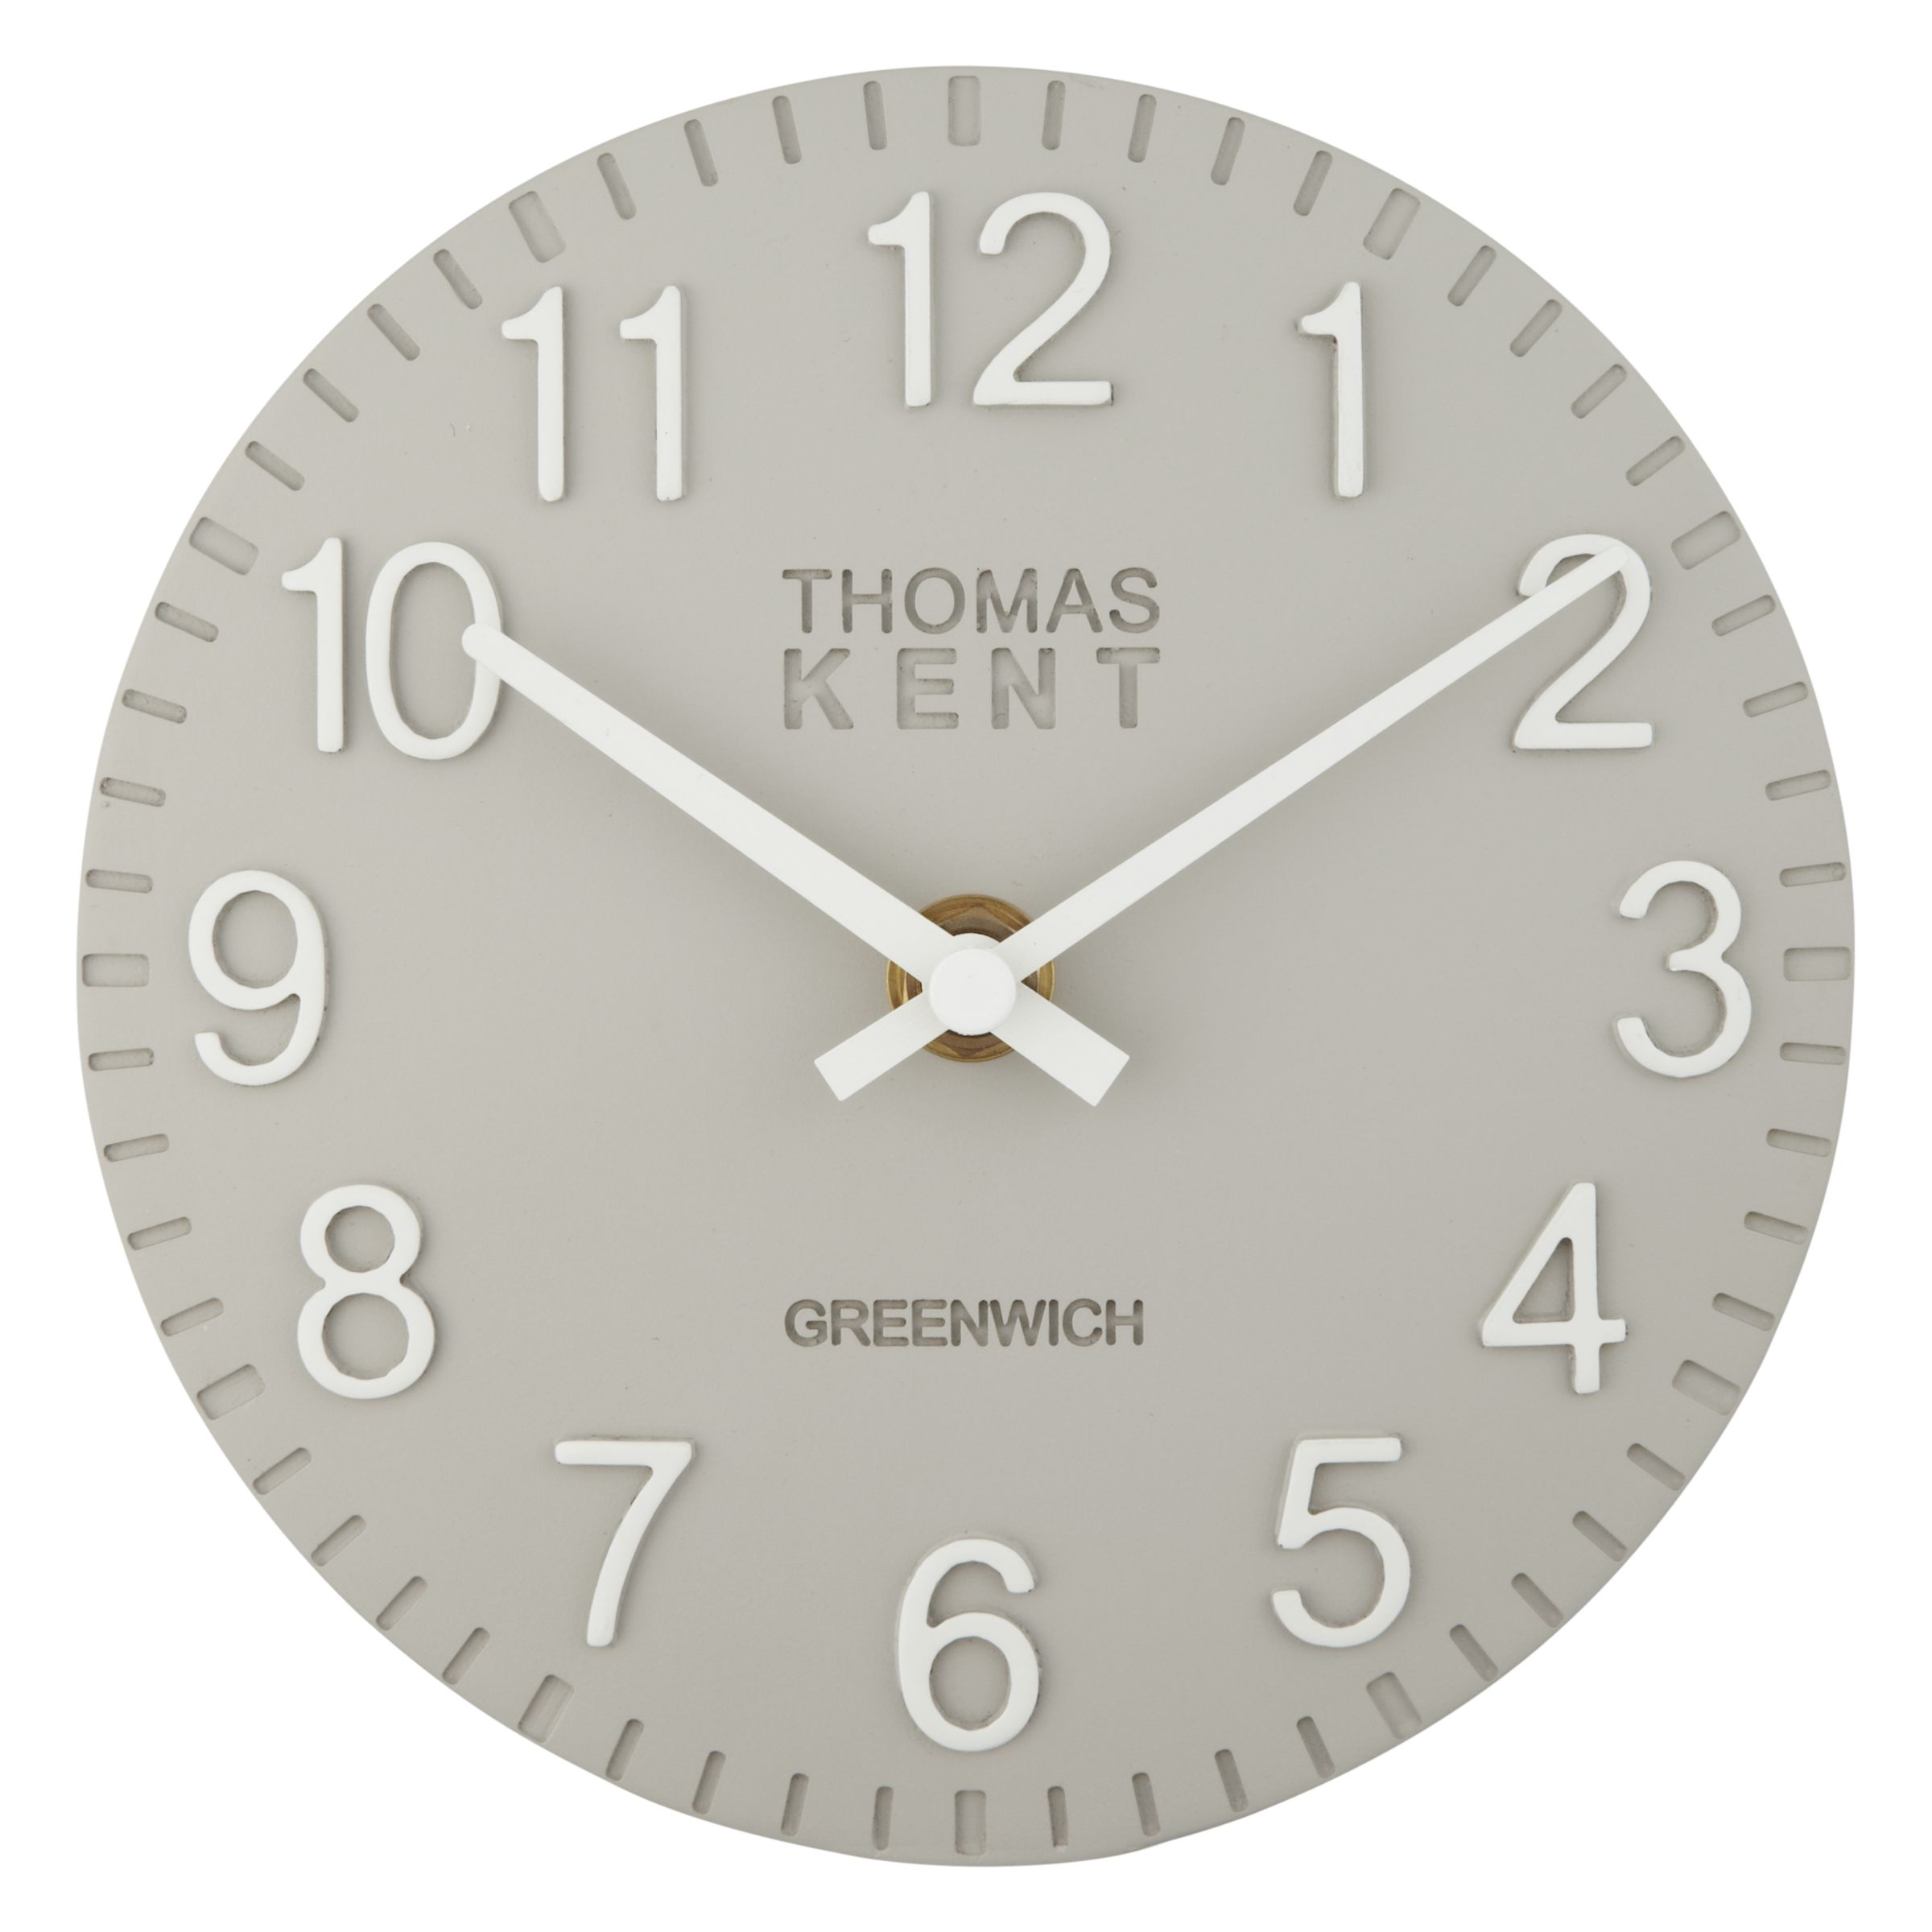 Thomas Kent Thomas Kent Cotswold Mantel Clock